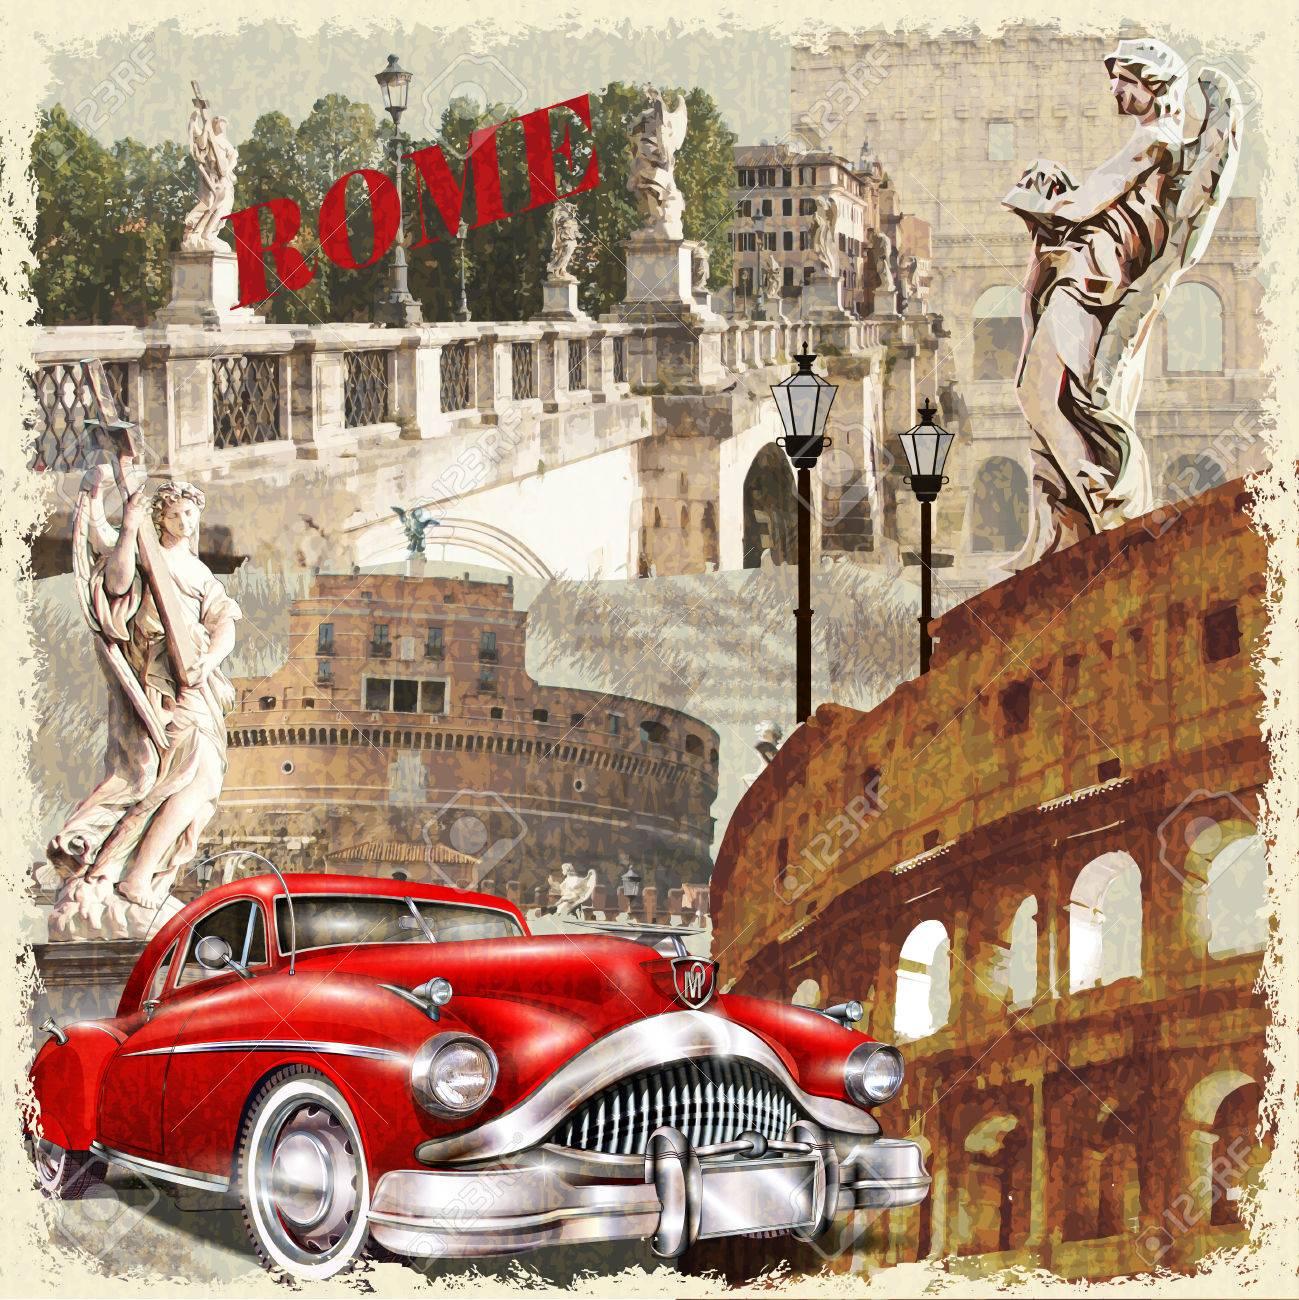 Rome vintage poster. - 69933354